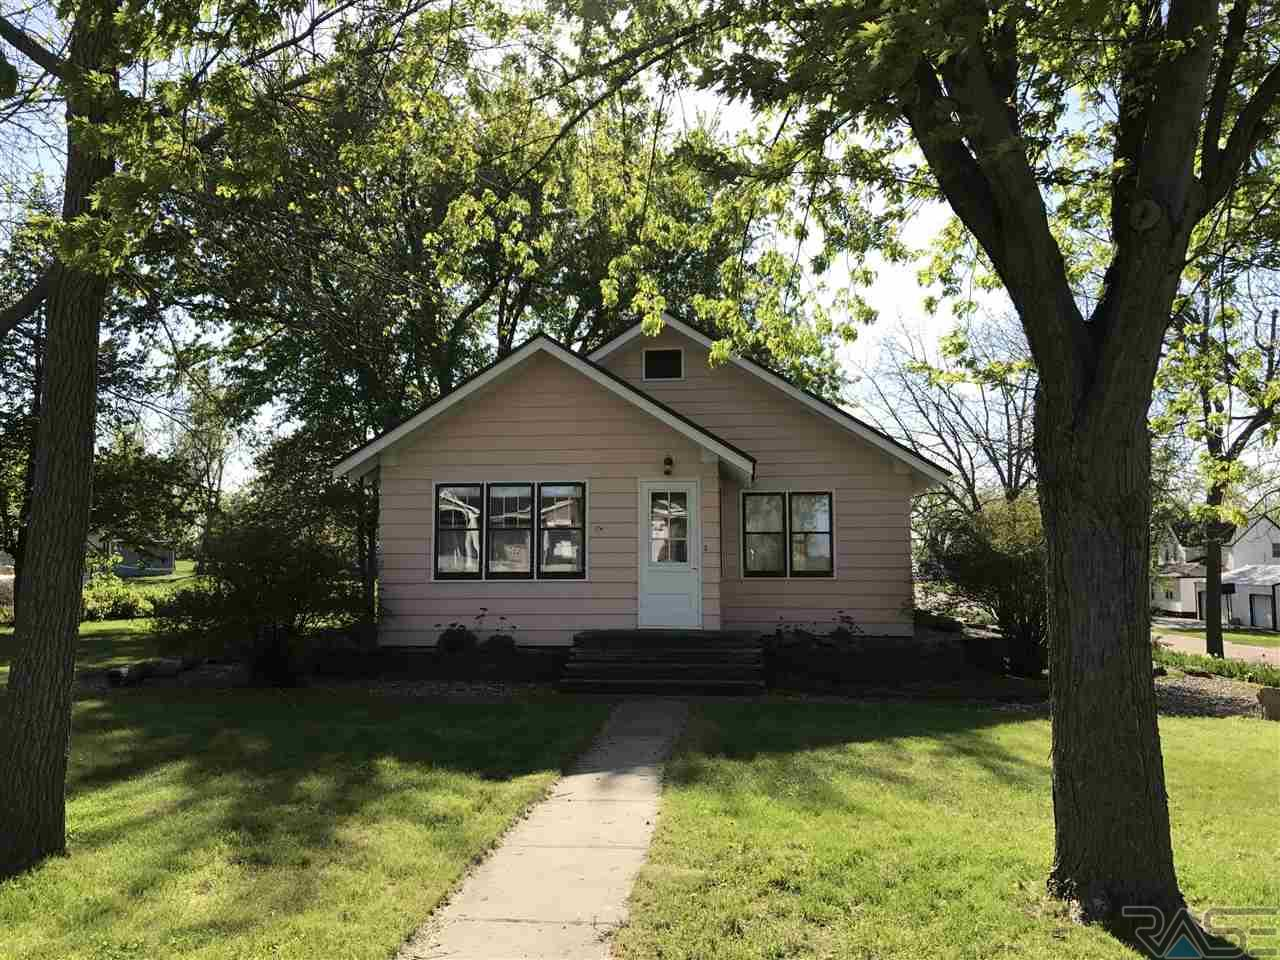 205 Pennsylvania Ave, Adrian, MN 56110